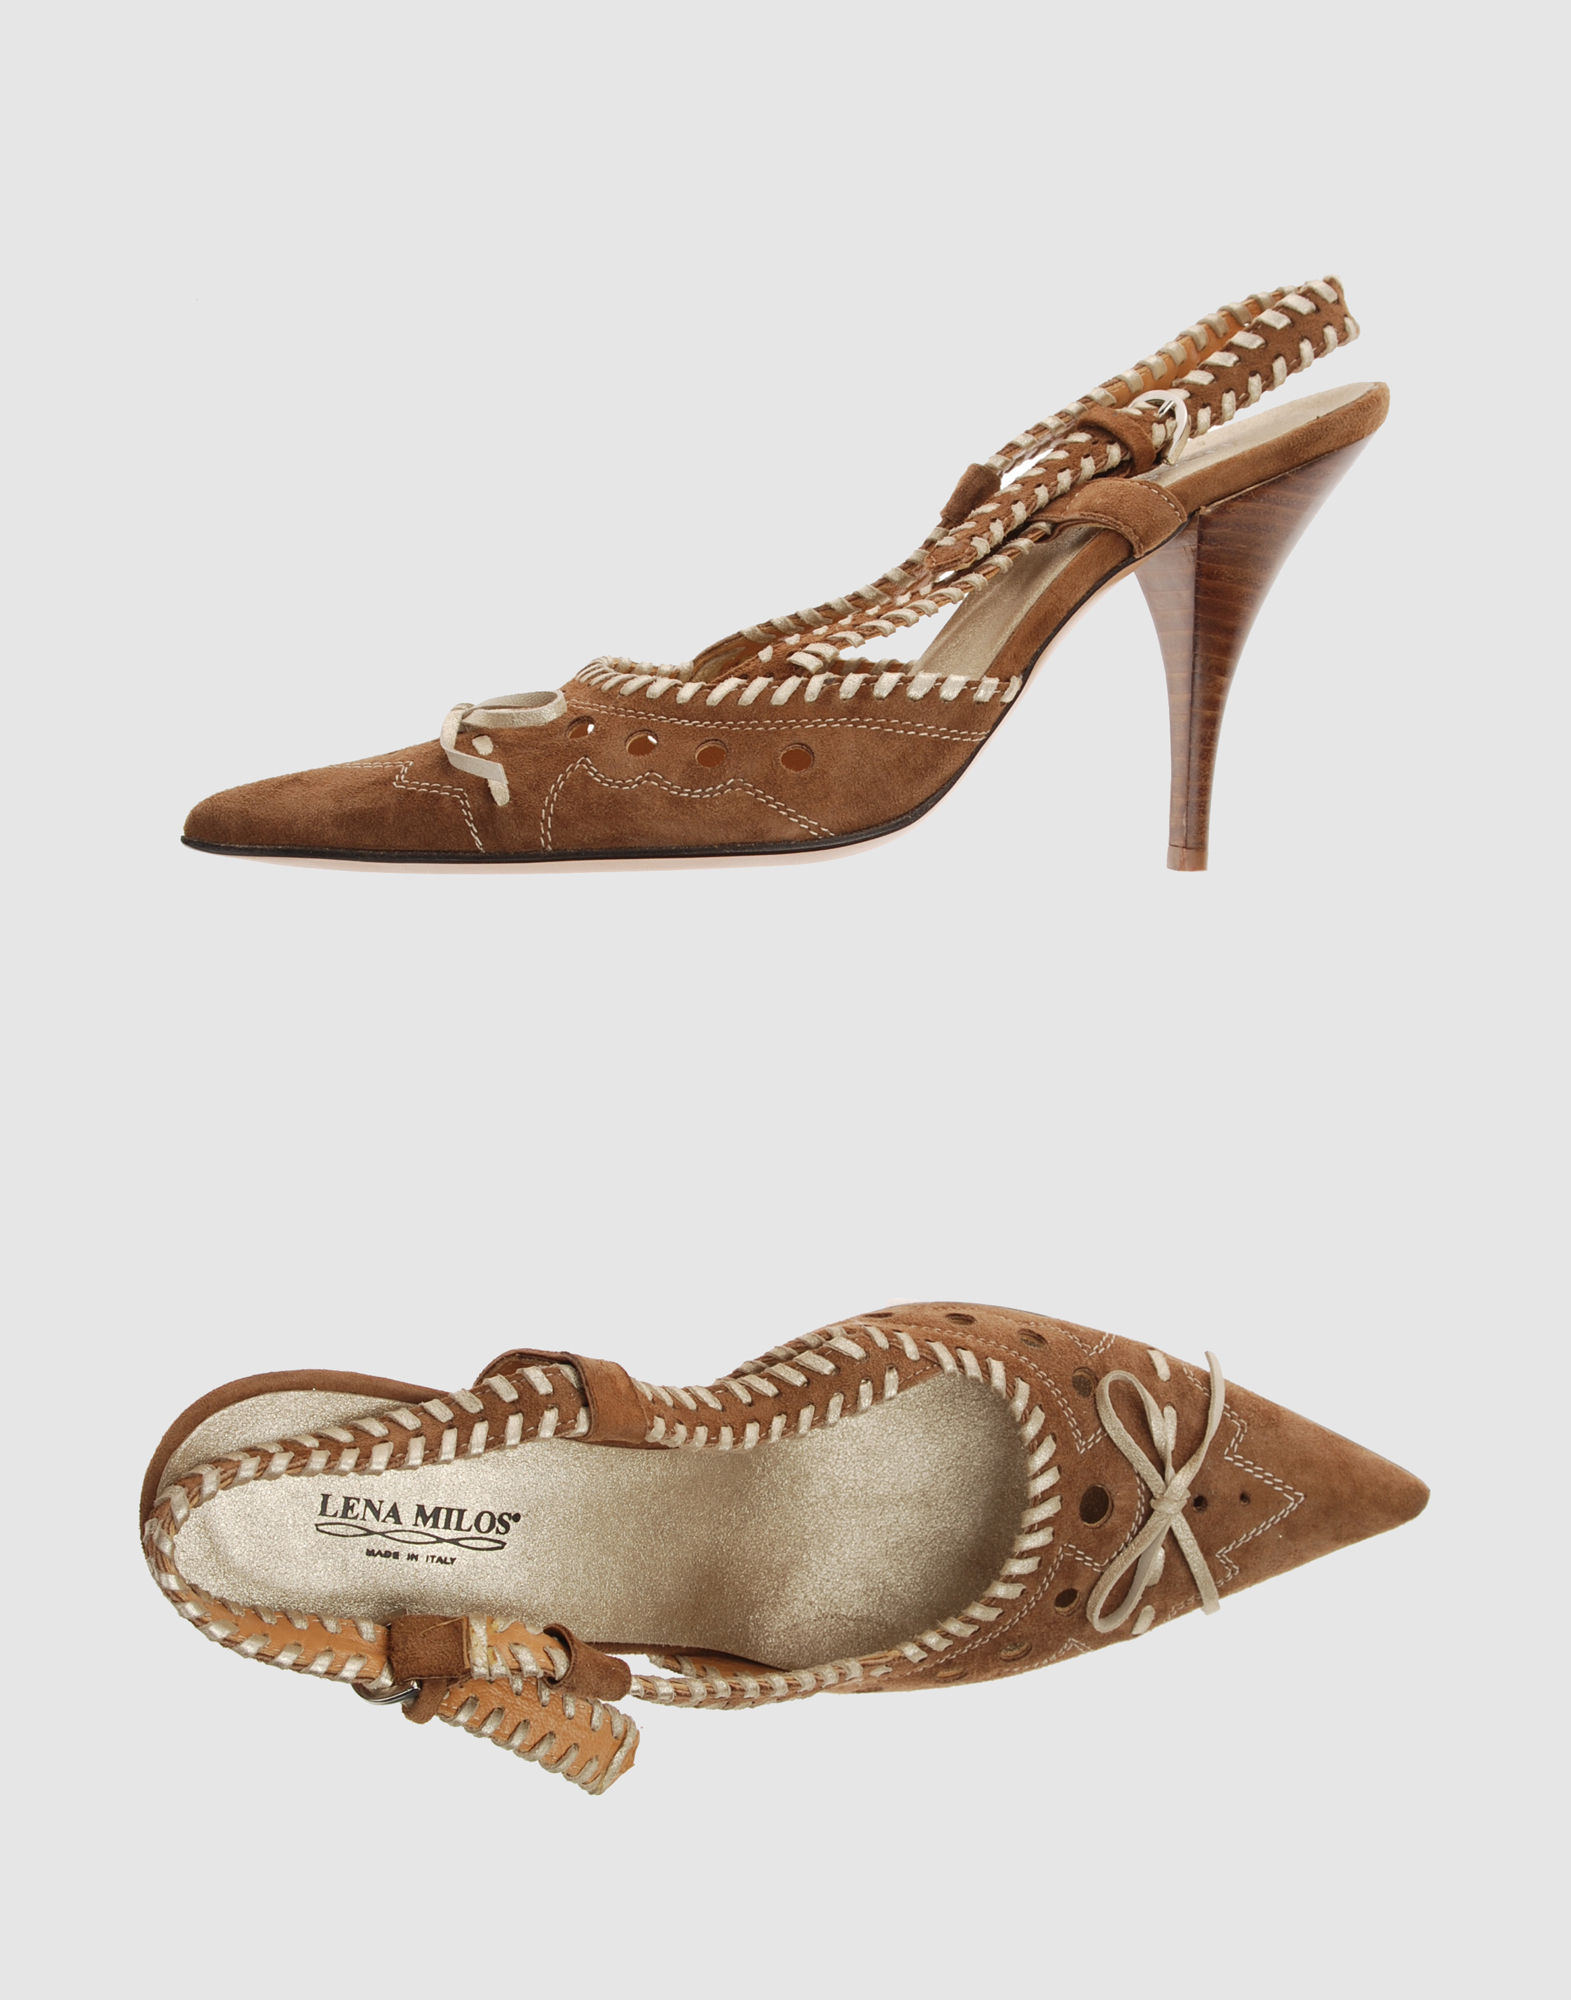 Lena Milos Pumps Qualität Damen  44111413 Gute Qualität Pumps beliebte Schuhe f8cb25